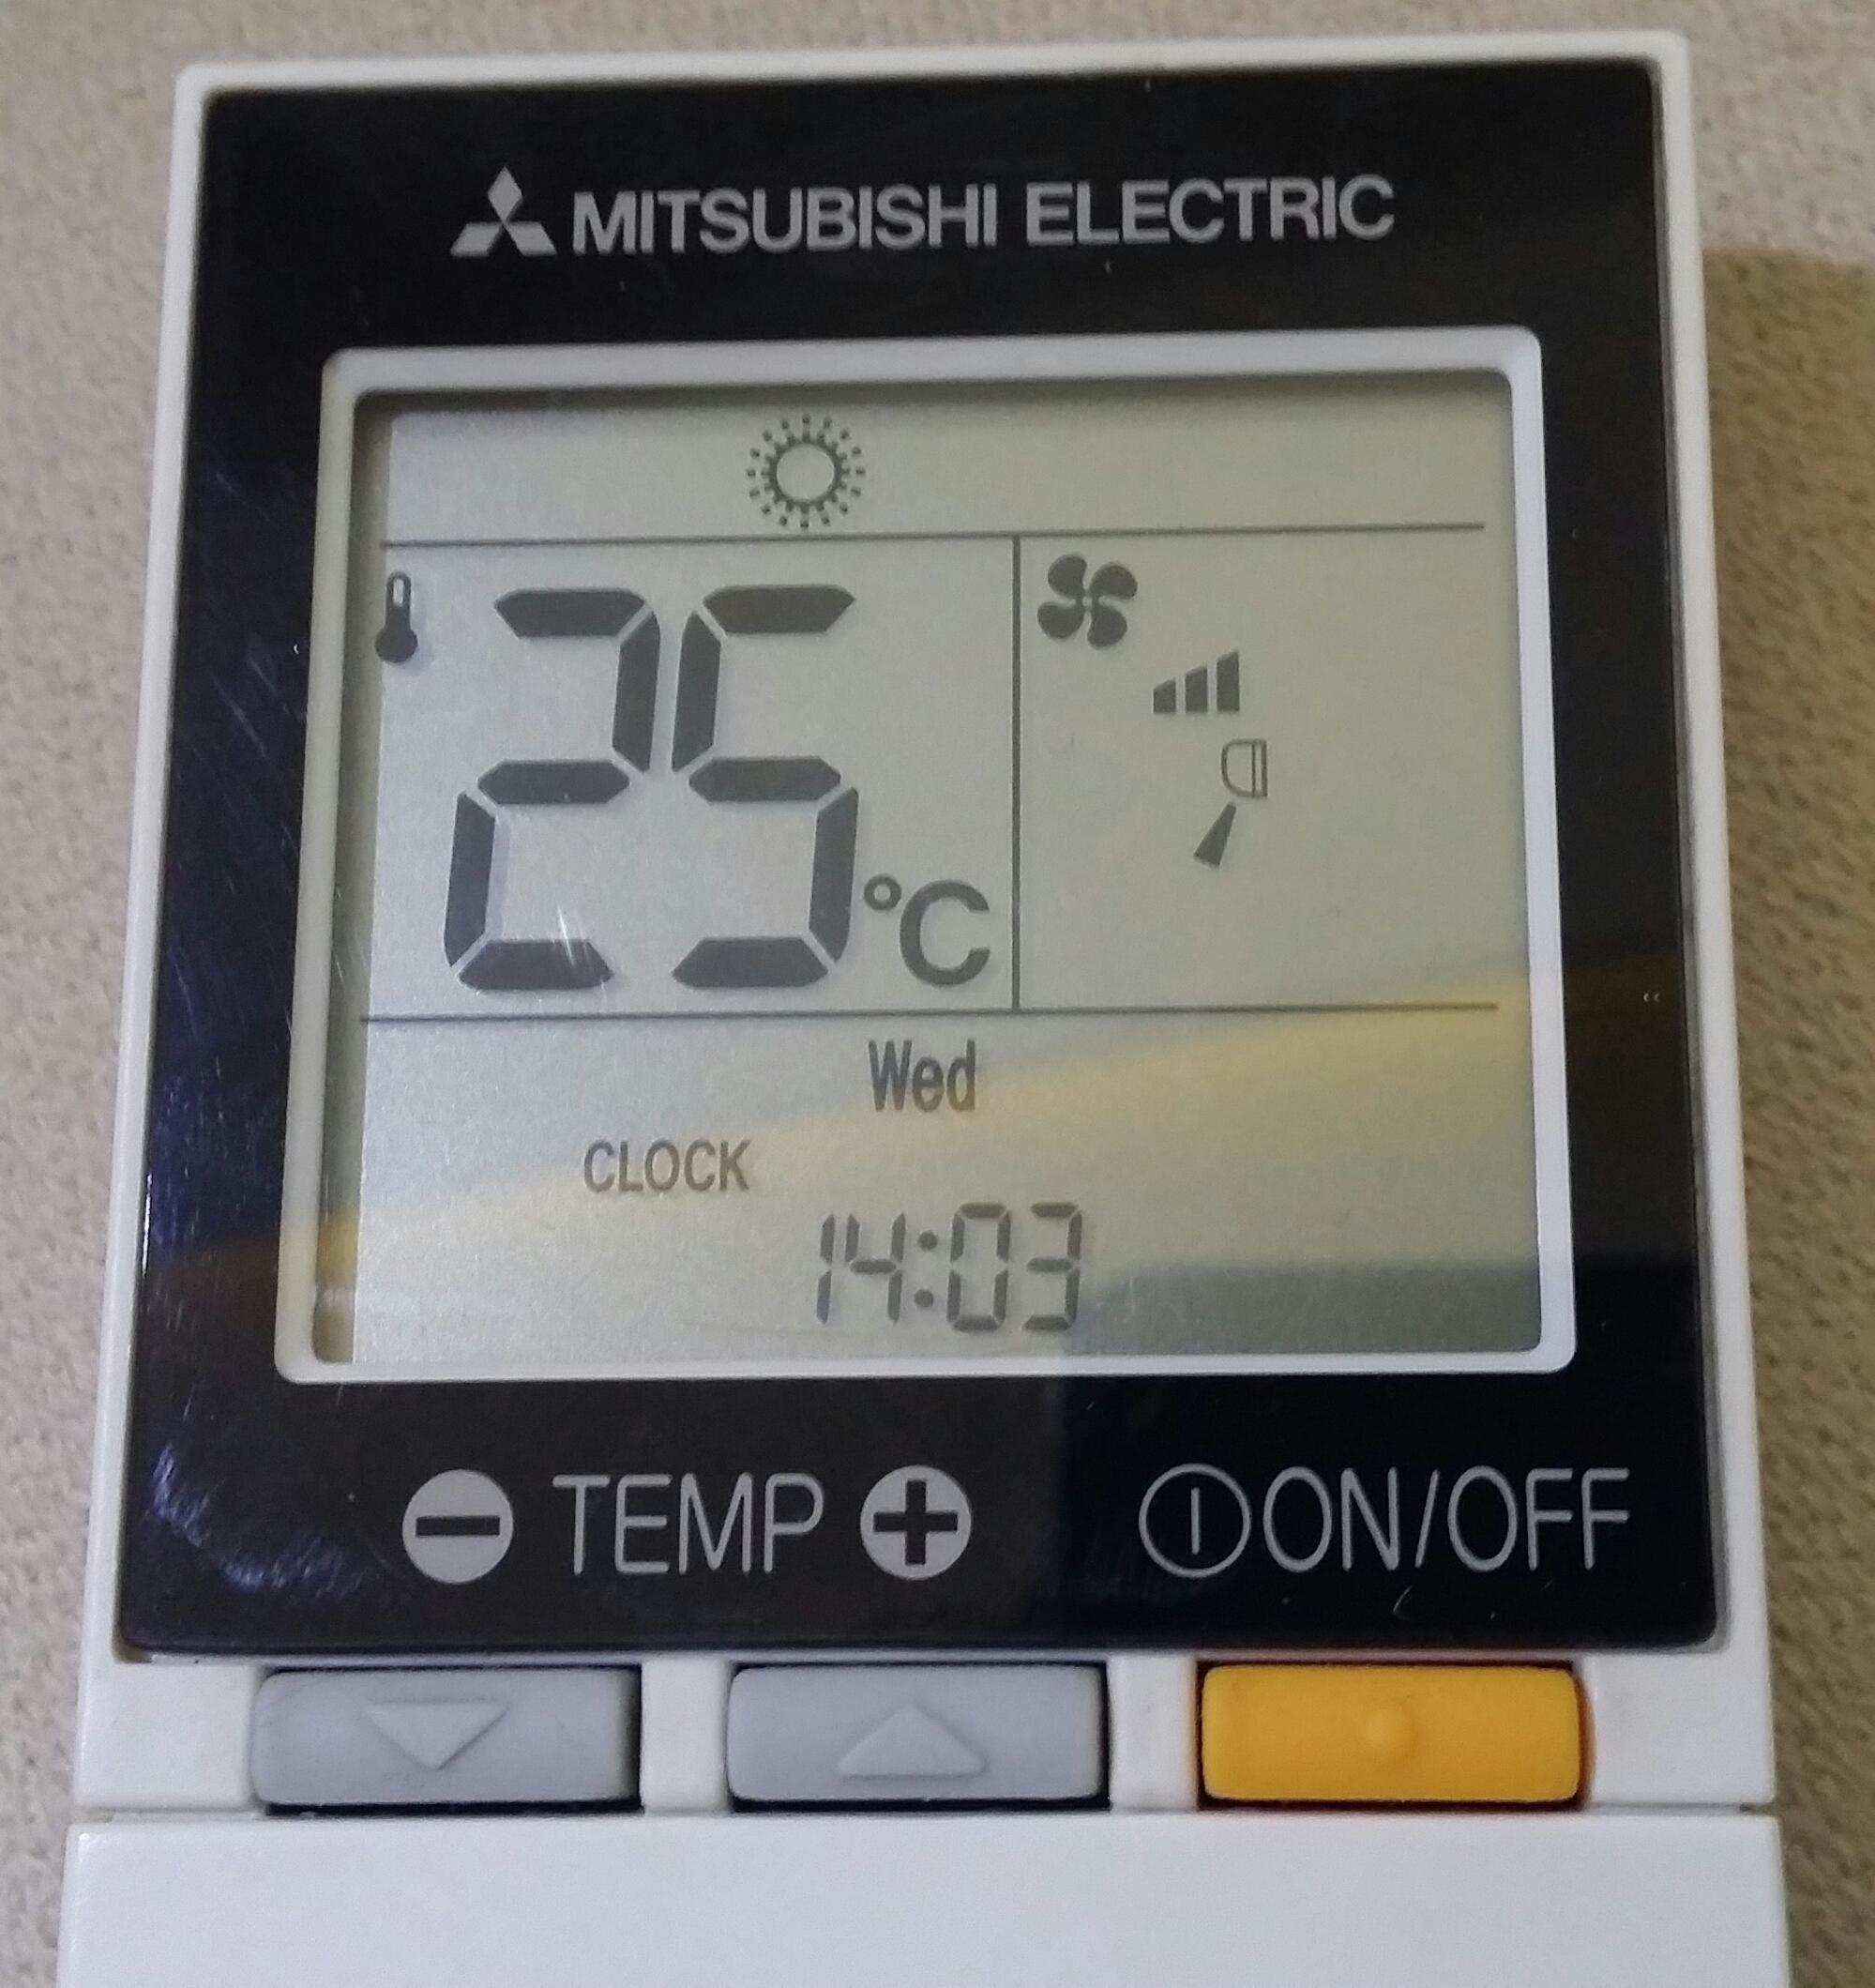 mitsubishi electric klima ısınma sorunu yardım » sayfa 1 - 1